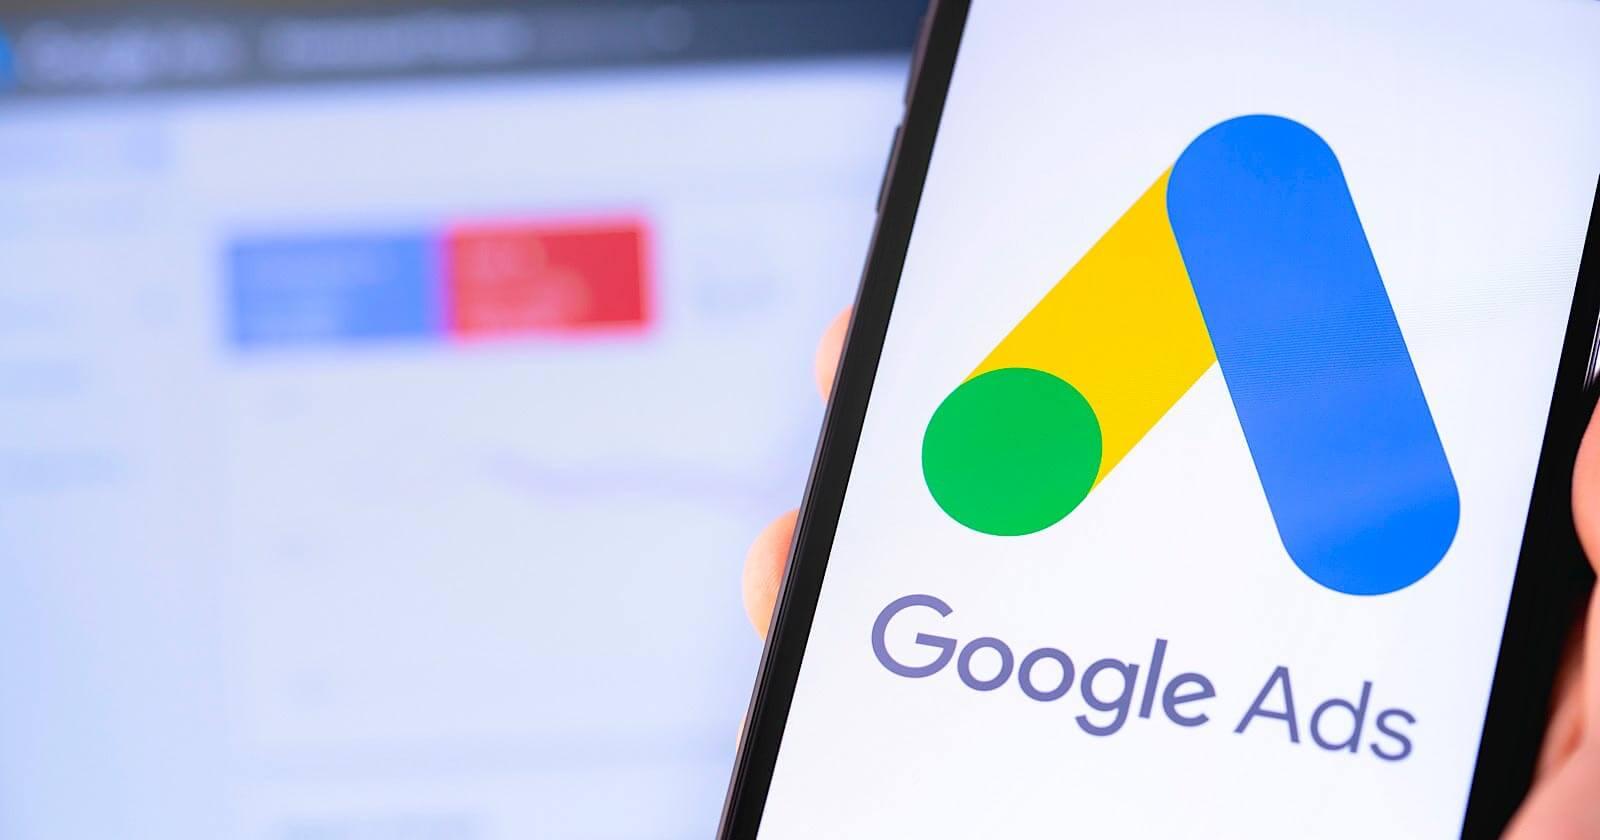 Google Ads: обновления сервиса, новости и тенденции контекстной рекламы, Фото № 4 - google-seo.pro